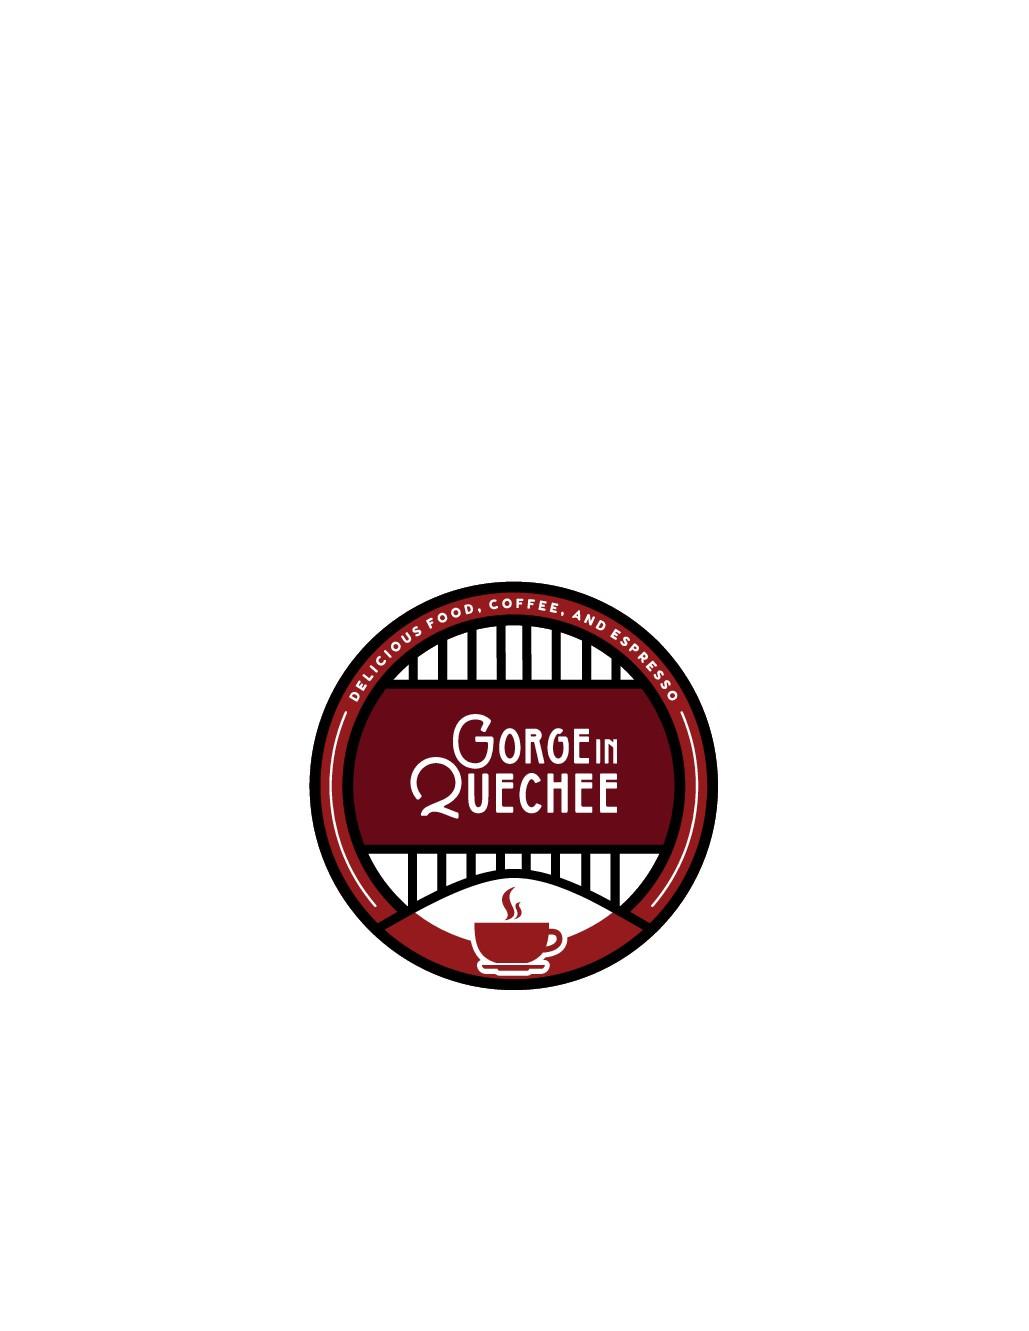 Design a fun and simple logo for new gourmet coffee shop, near a vermont landmark.